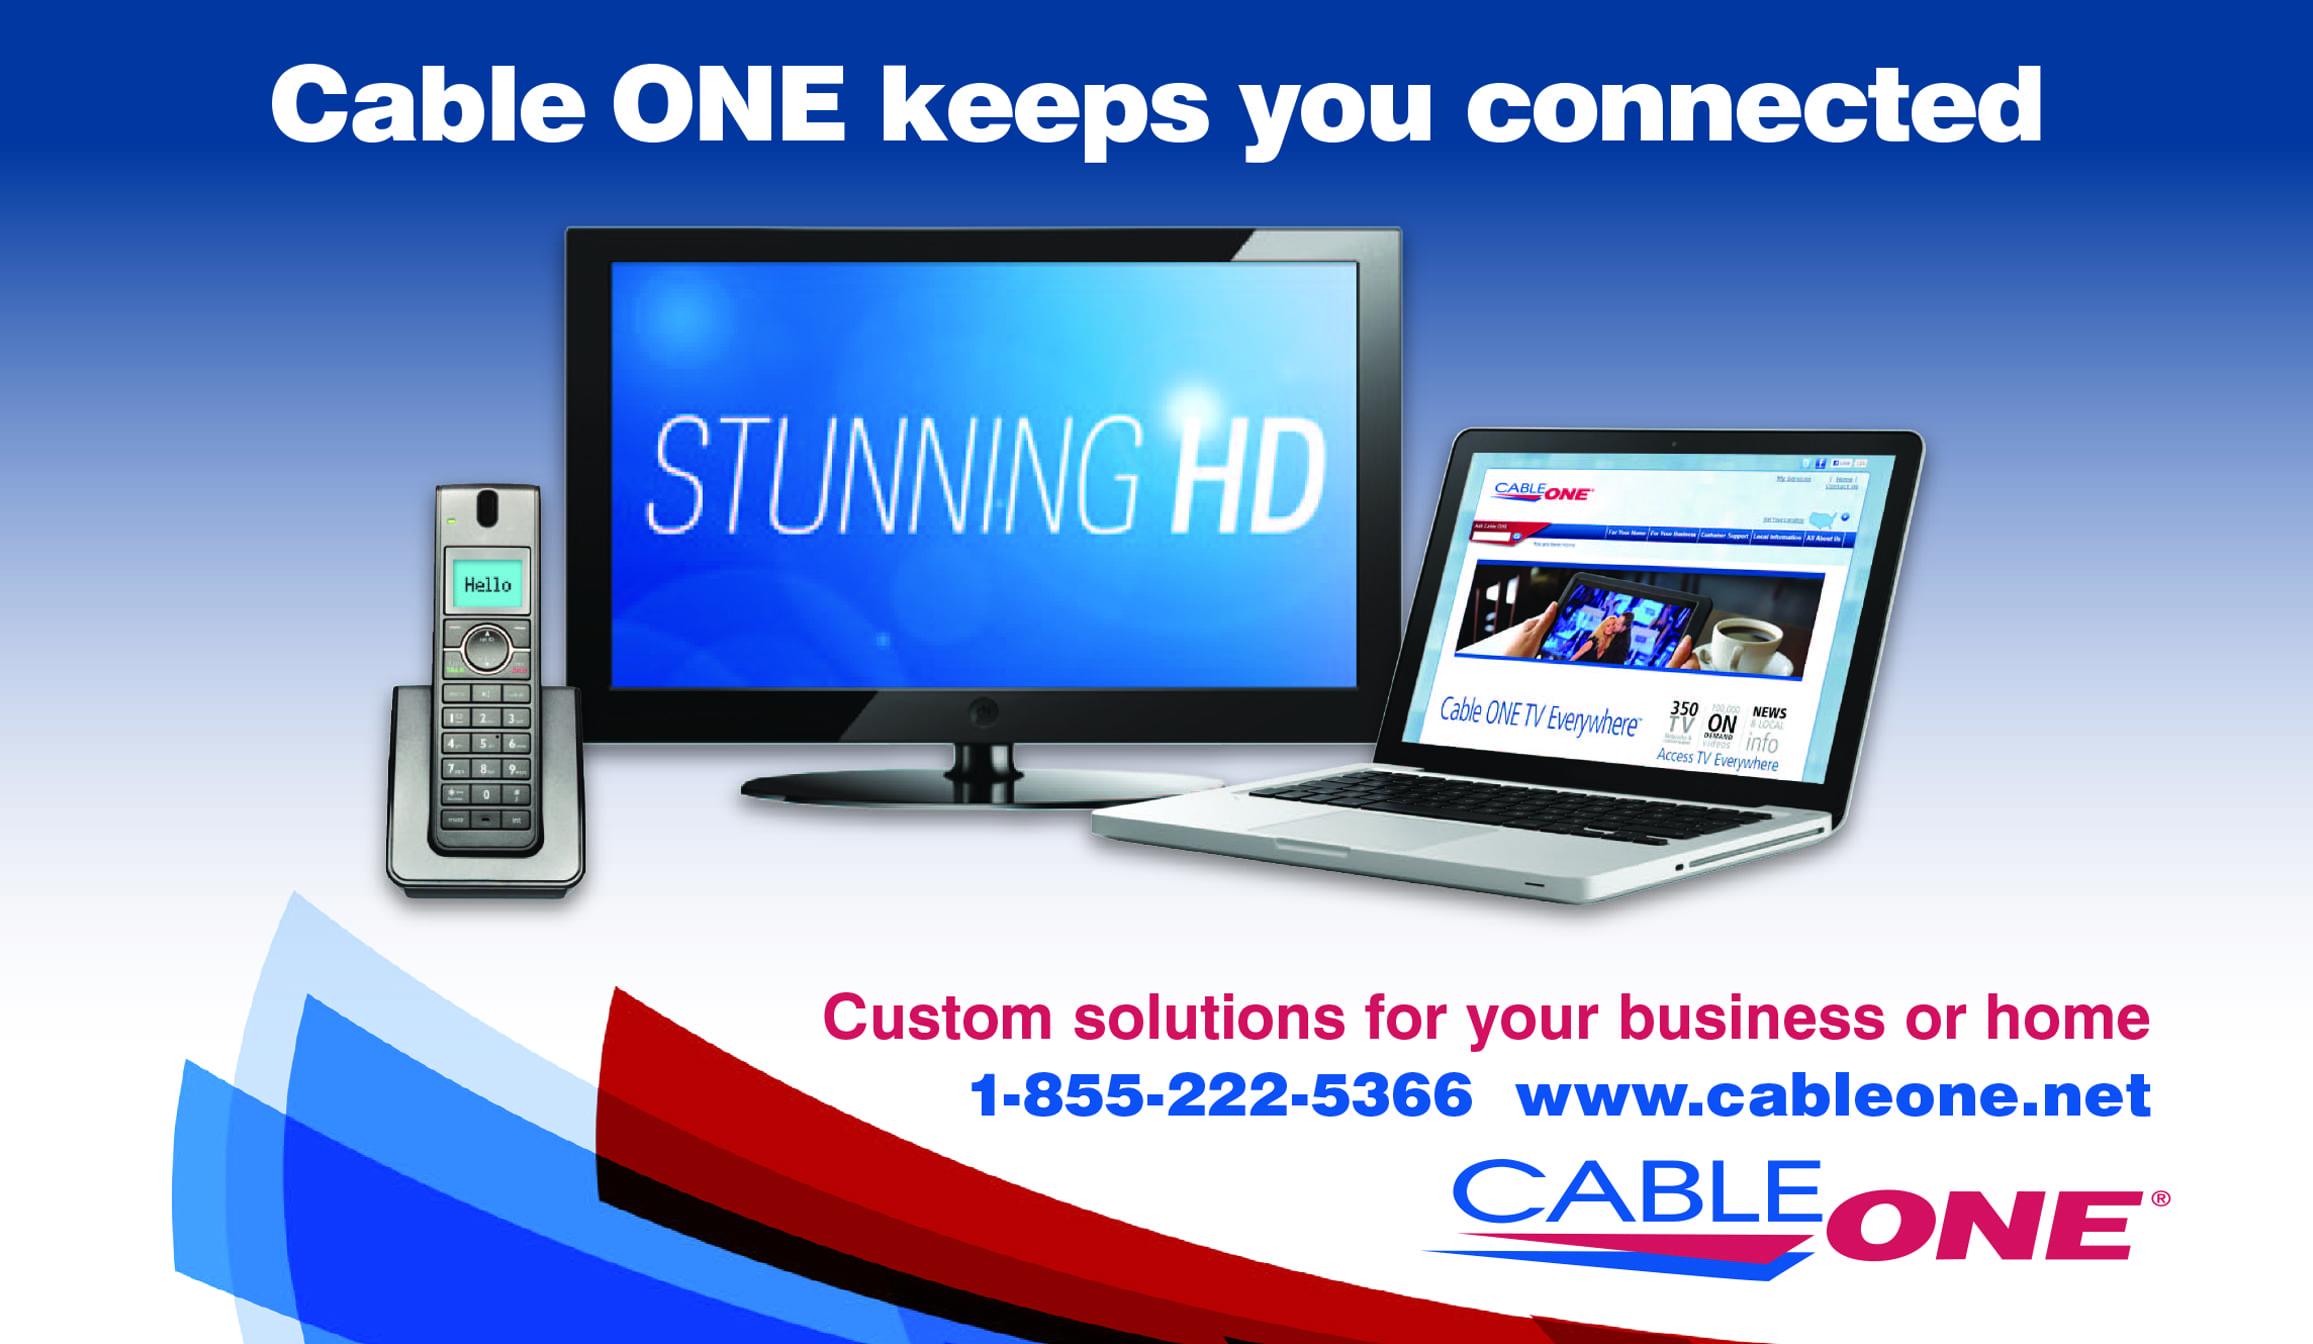 CableOne ad (image)